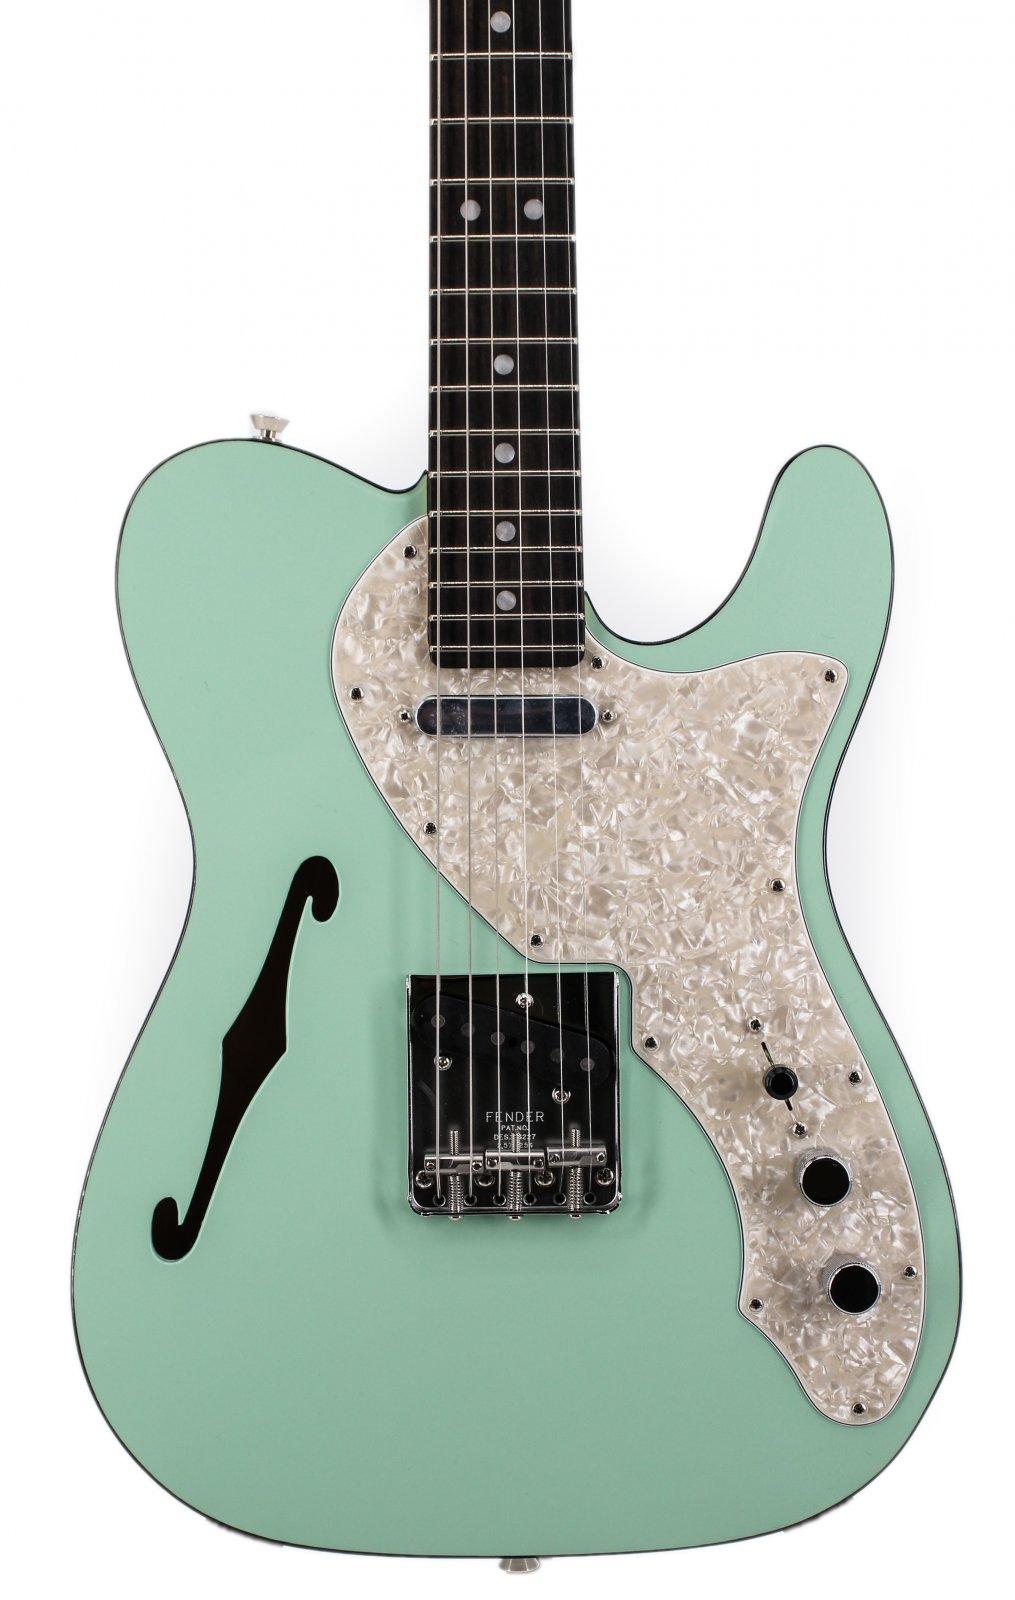 Fender 2-Tone Thinline Telecaster Seafoam Green Ebony Board